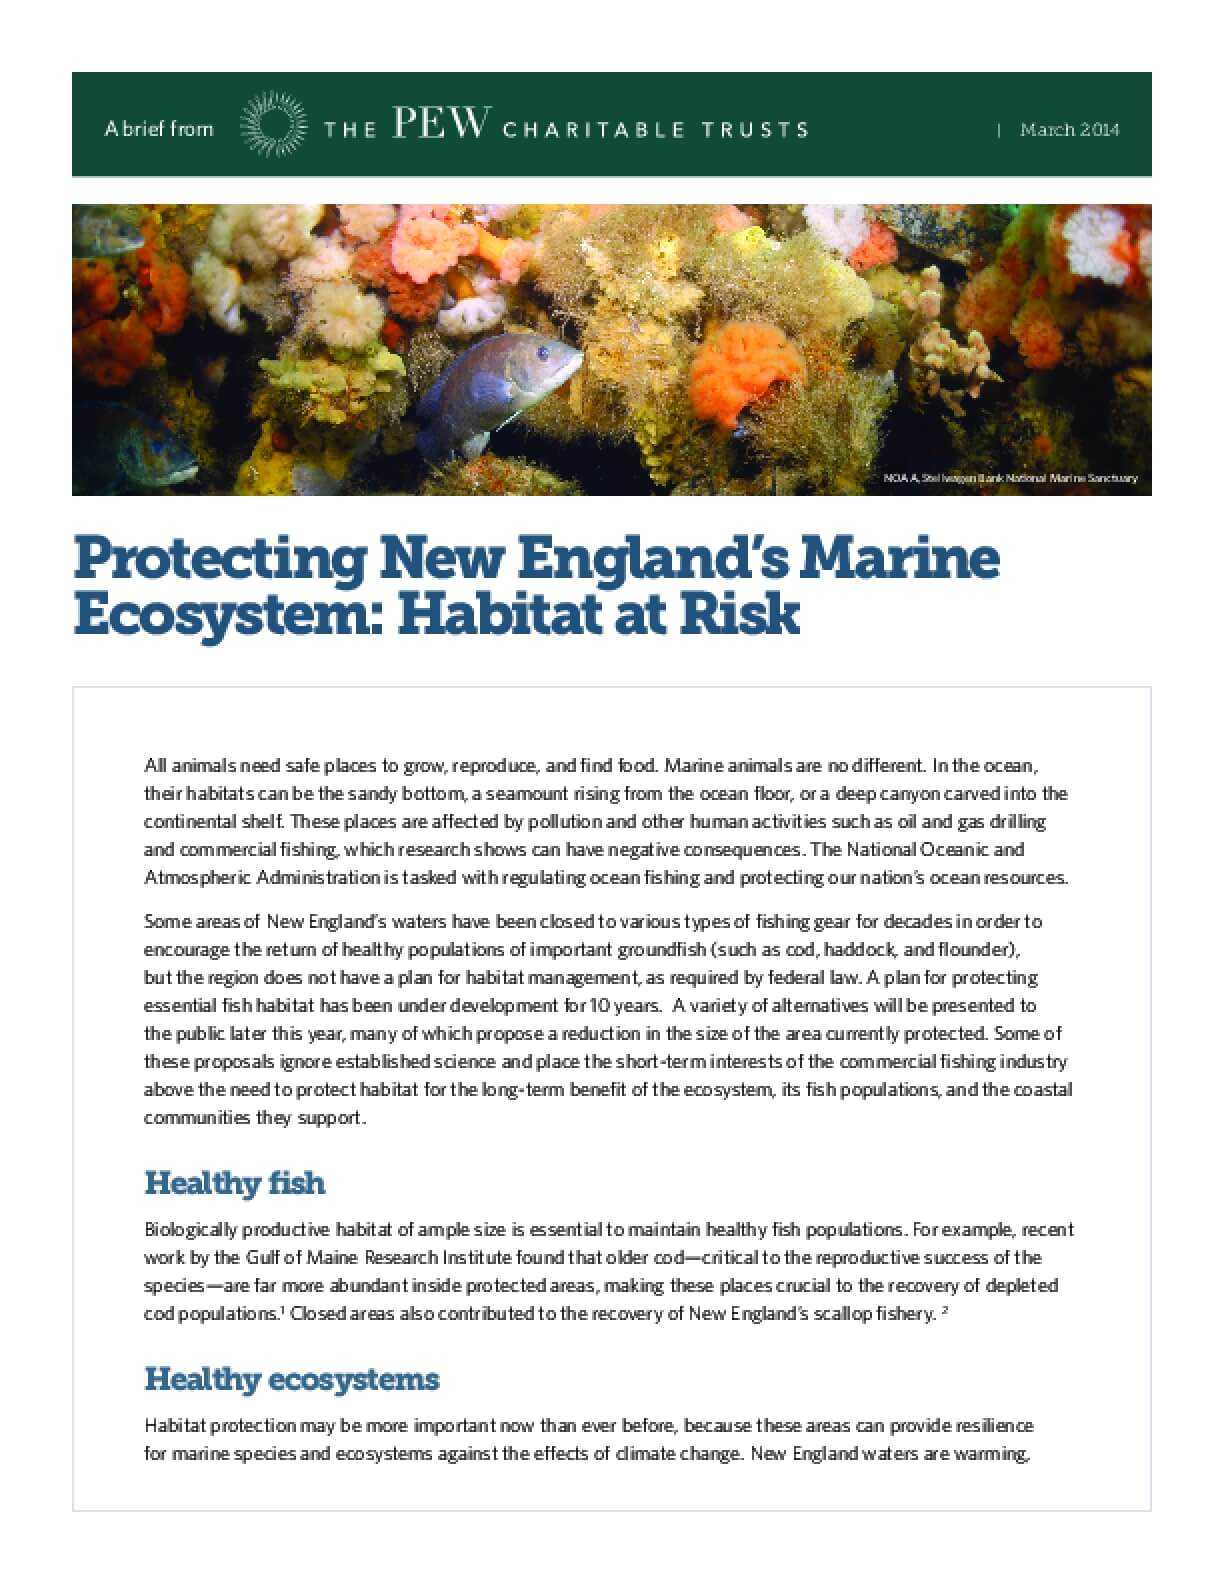 Protecting New England's Marine Ecosystem: Habitat at Risk